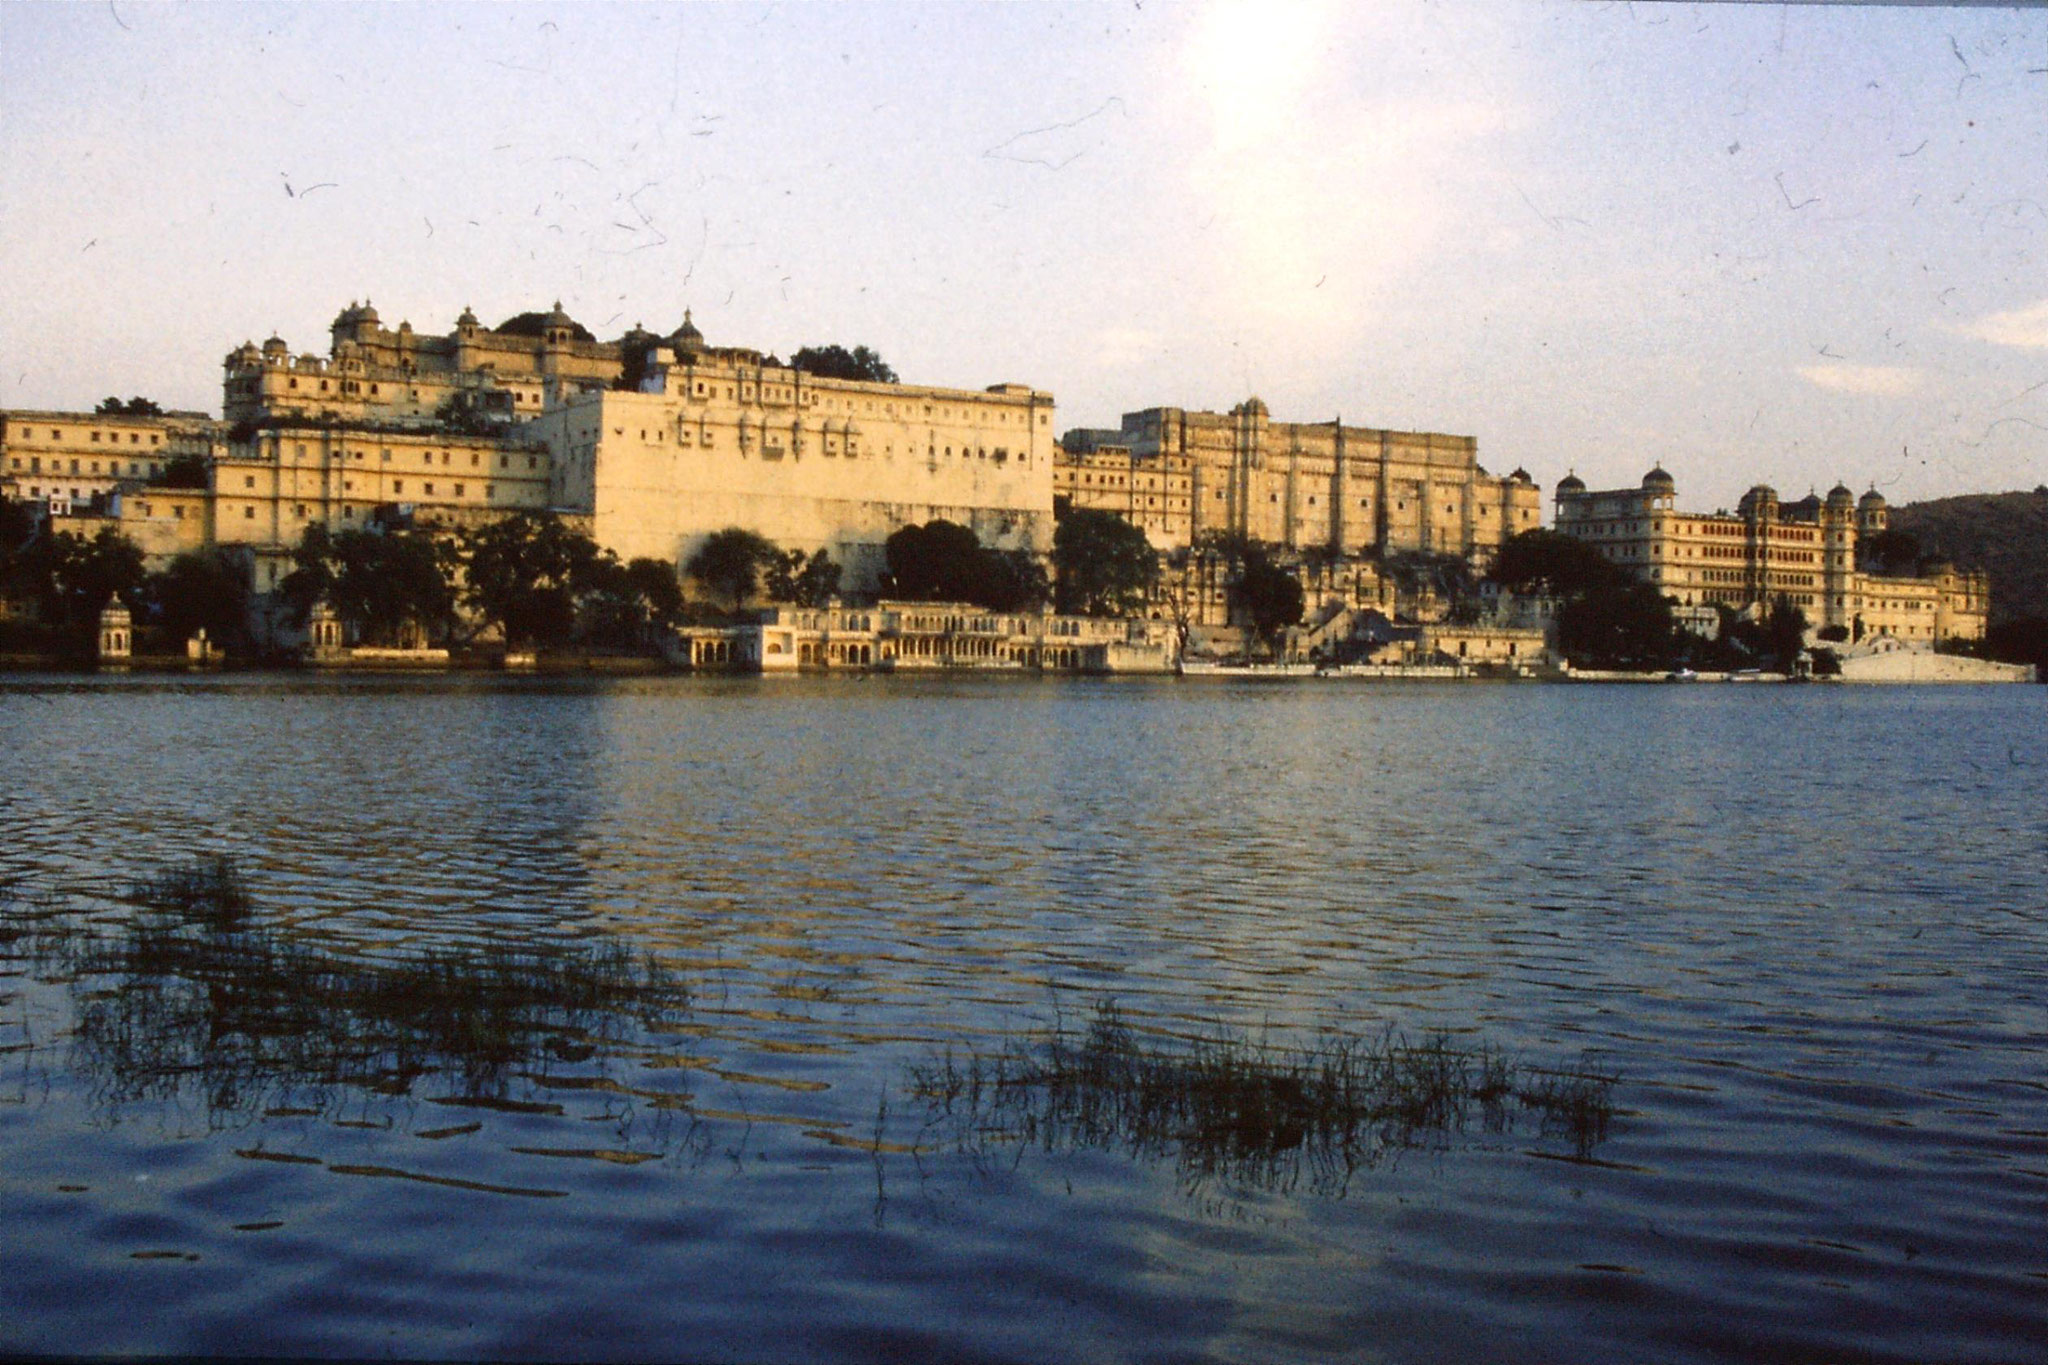 7/12/1989: 23: Udaipur Palace Museum